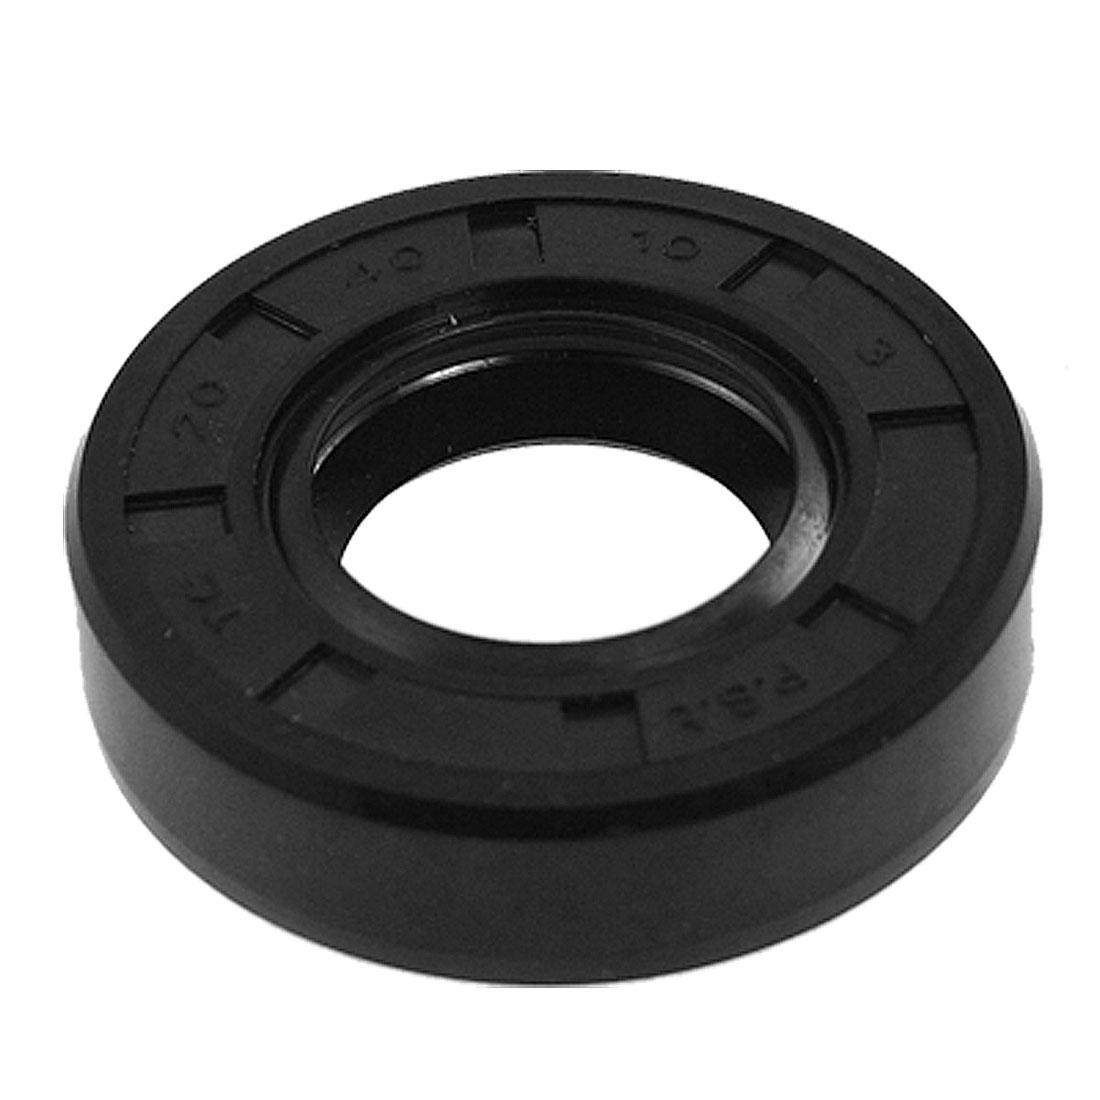 Metric Rotary Shaft Oil Seal 20 x 40 x 10 20x40x10mm TC Double Lipped